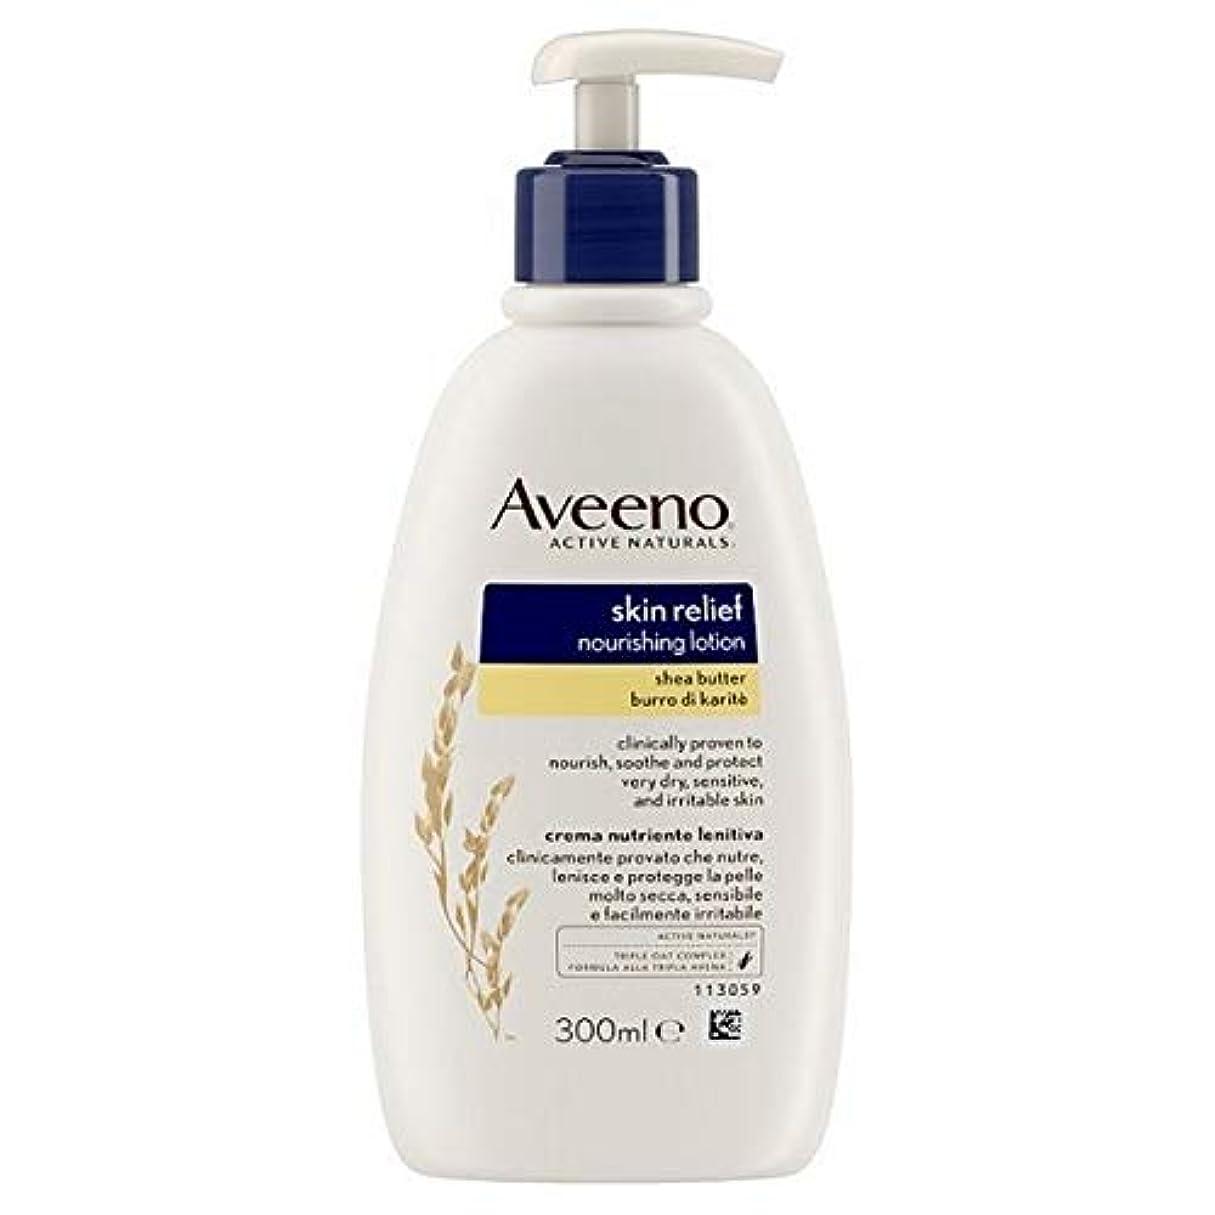 [Aveeno] Aveenoスキンリリーフローション300ミリリットル - Aveeno Skin Relief Lotion 300ml [並行輸入品]